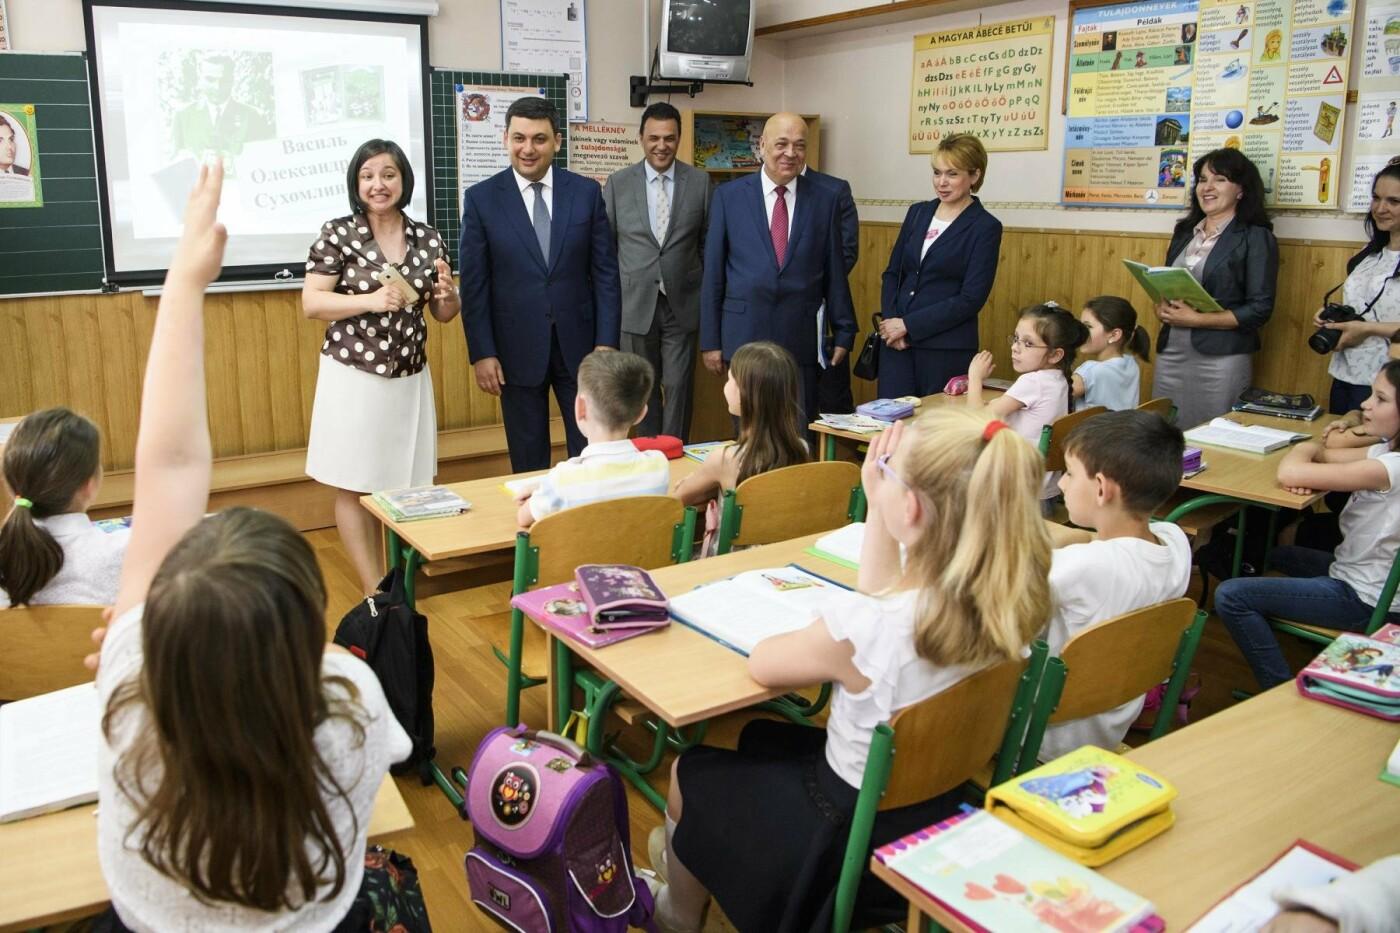 Вчителям України хочуть підняти зарплатню, фото-1